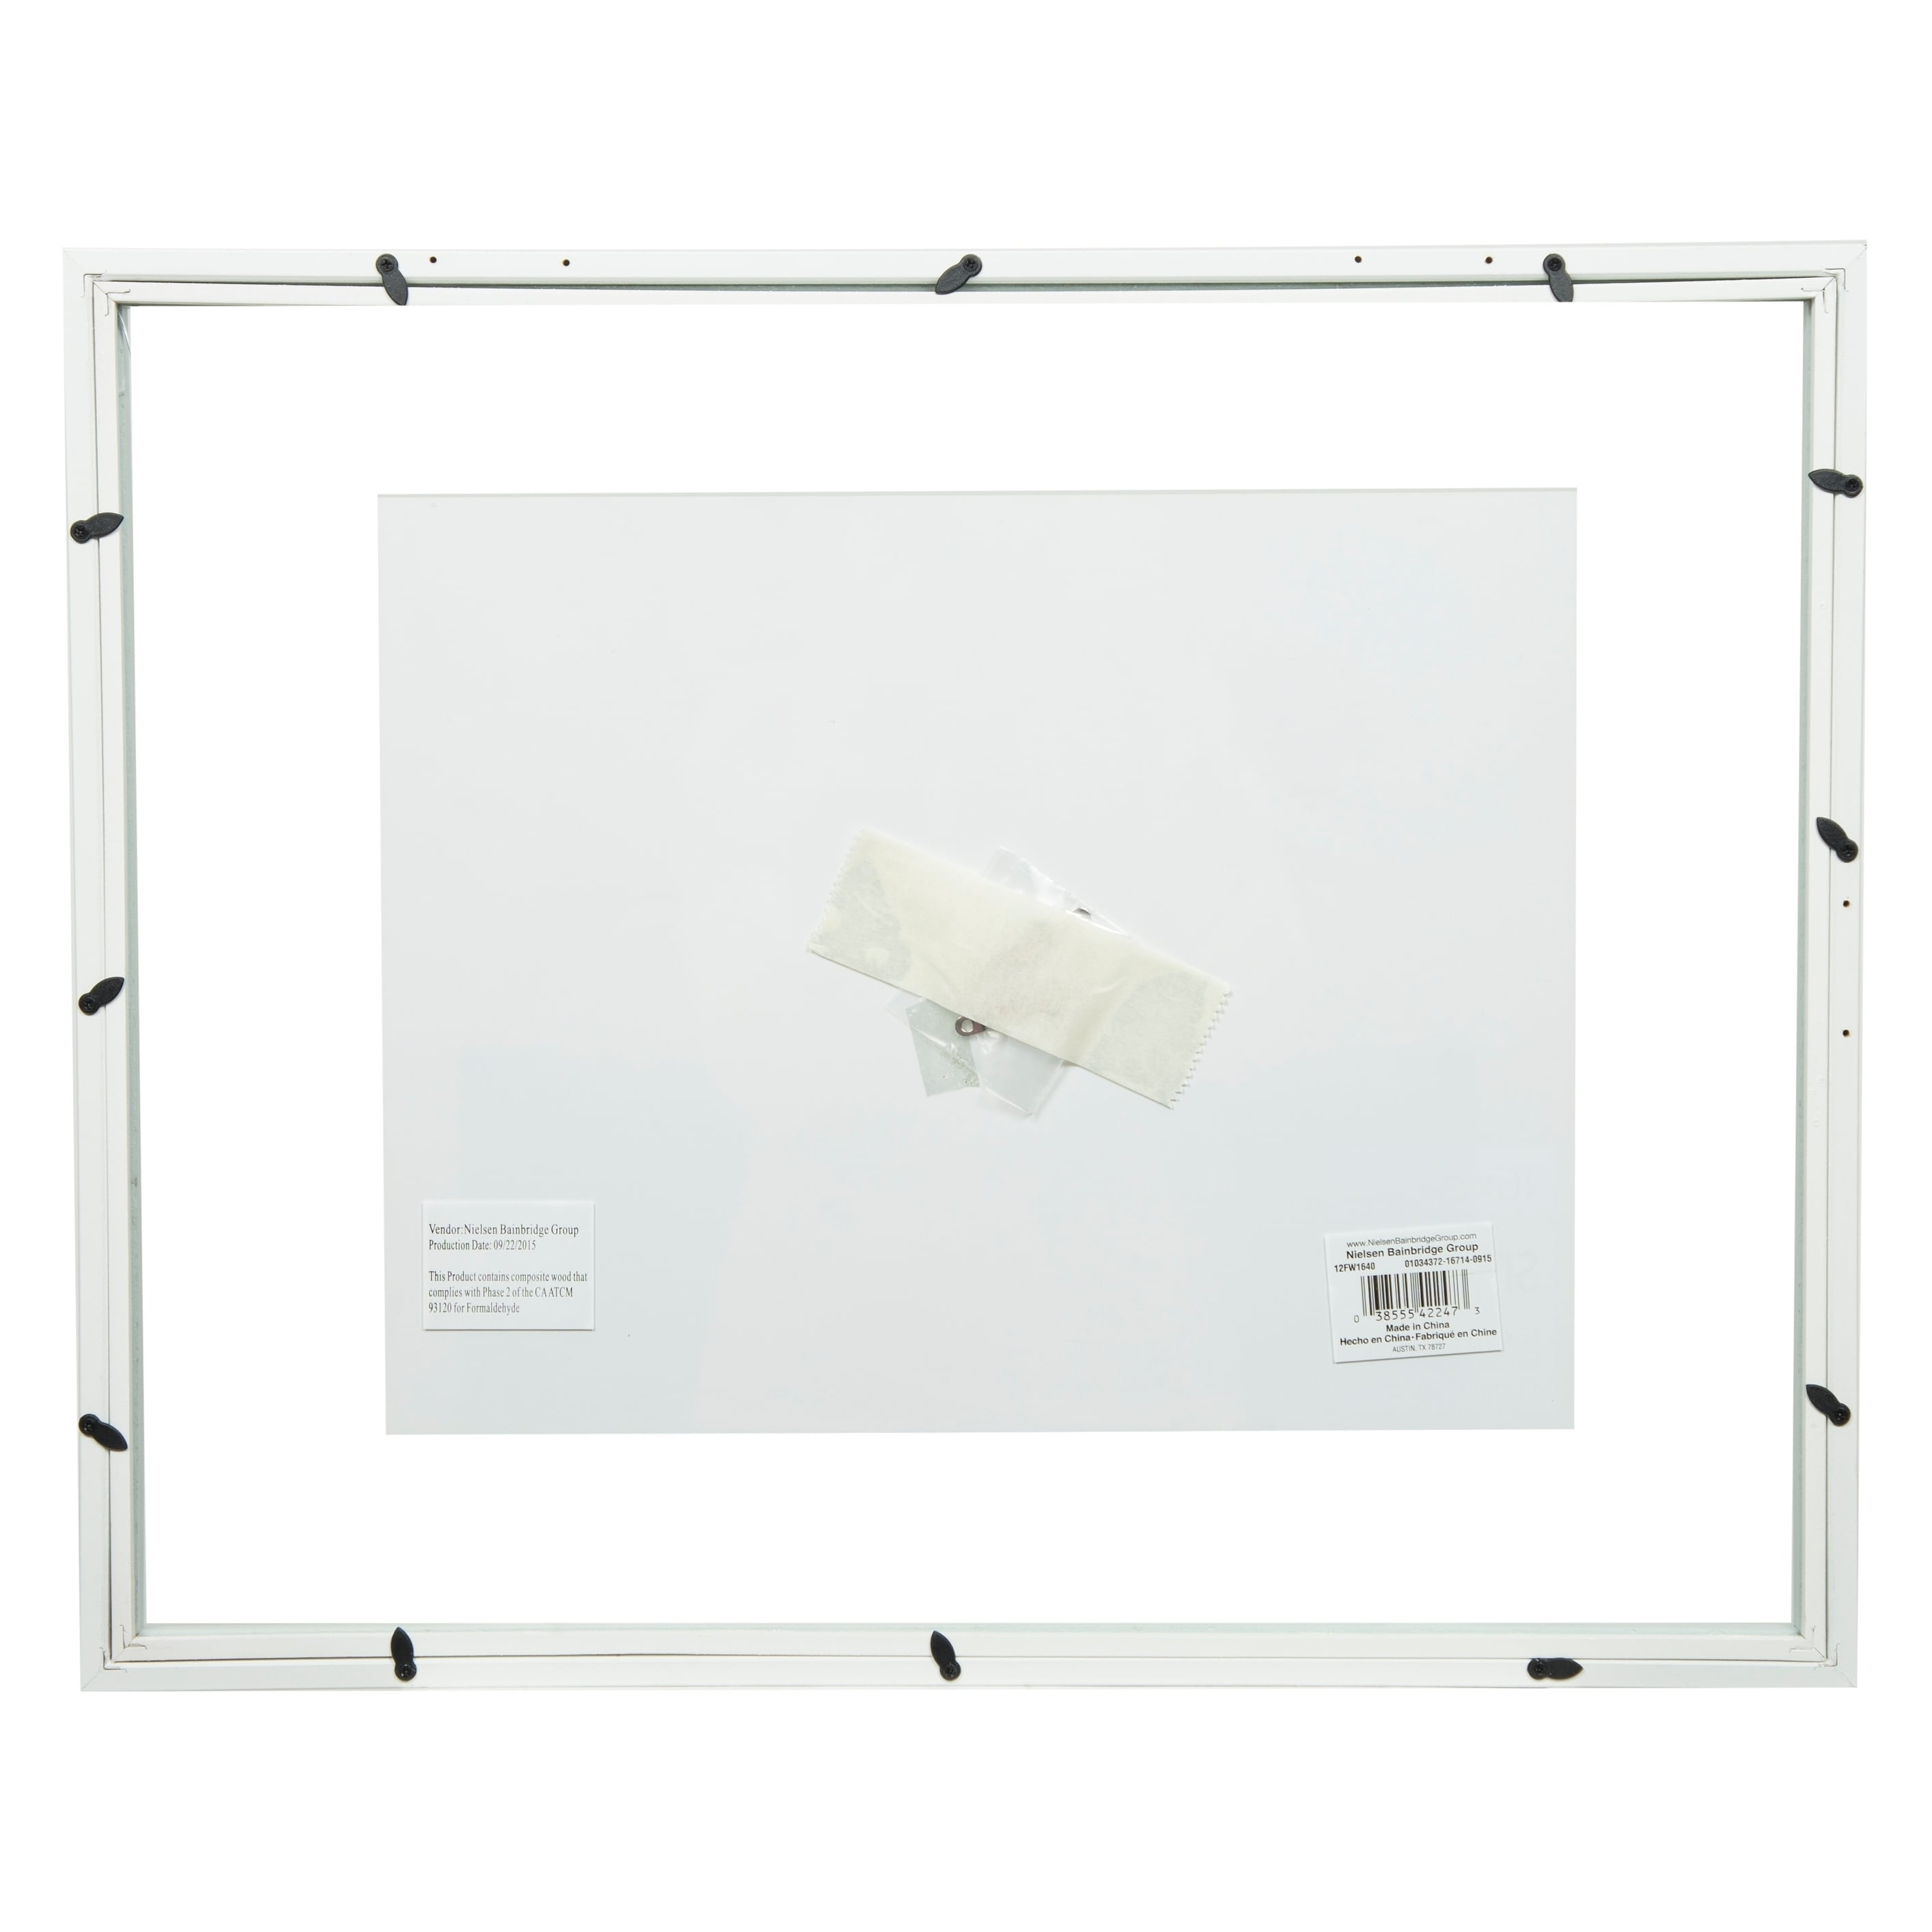 fff09253849 Atractivo 11x14 White Picture Frame Motivo - Ideas de Arte Enmarcado ...